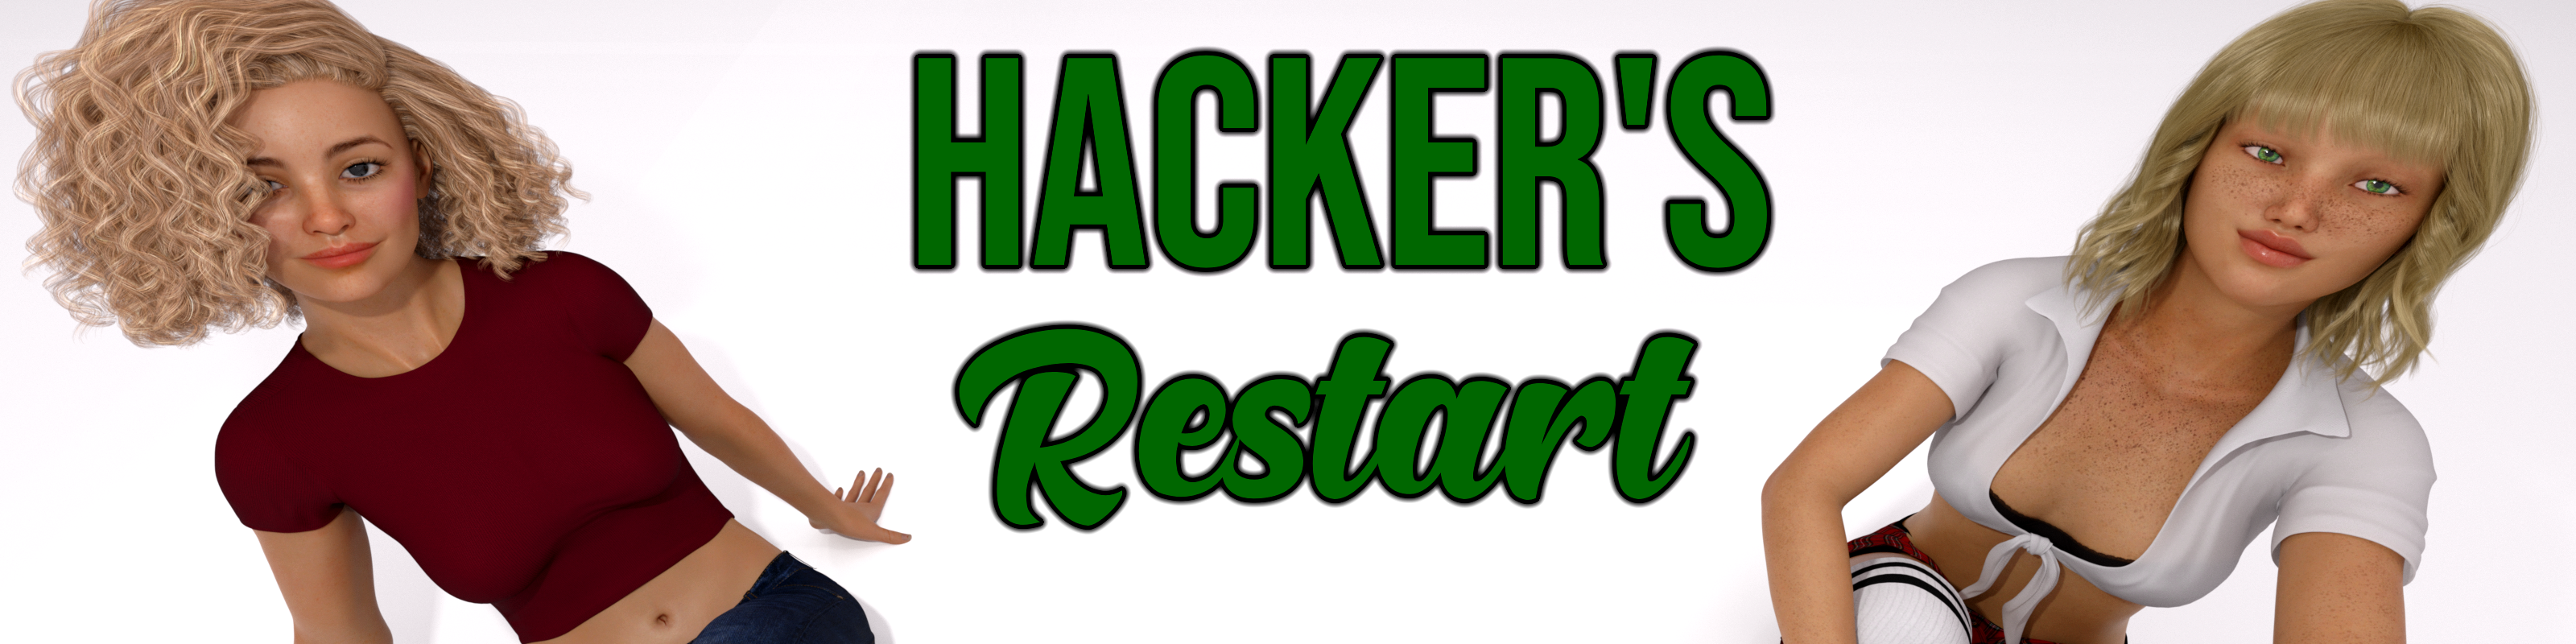 Hacker's Restart (NSFW)